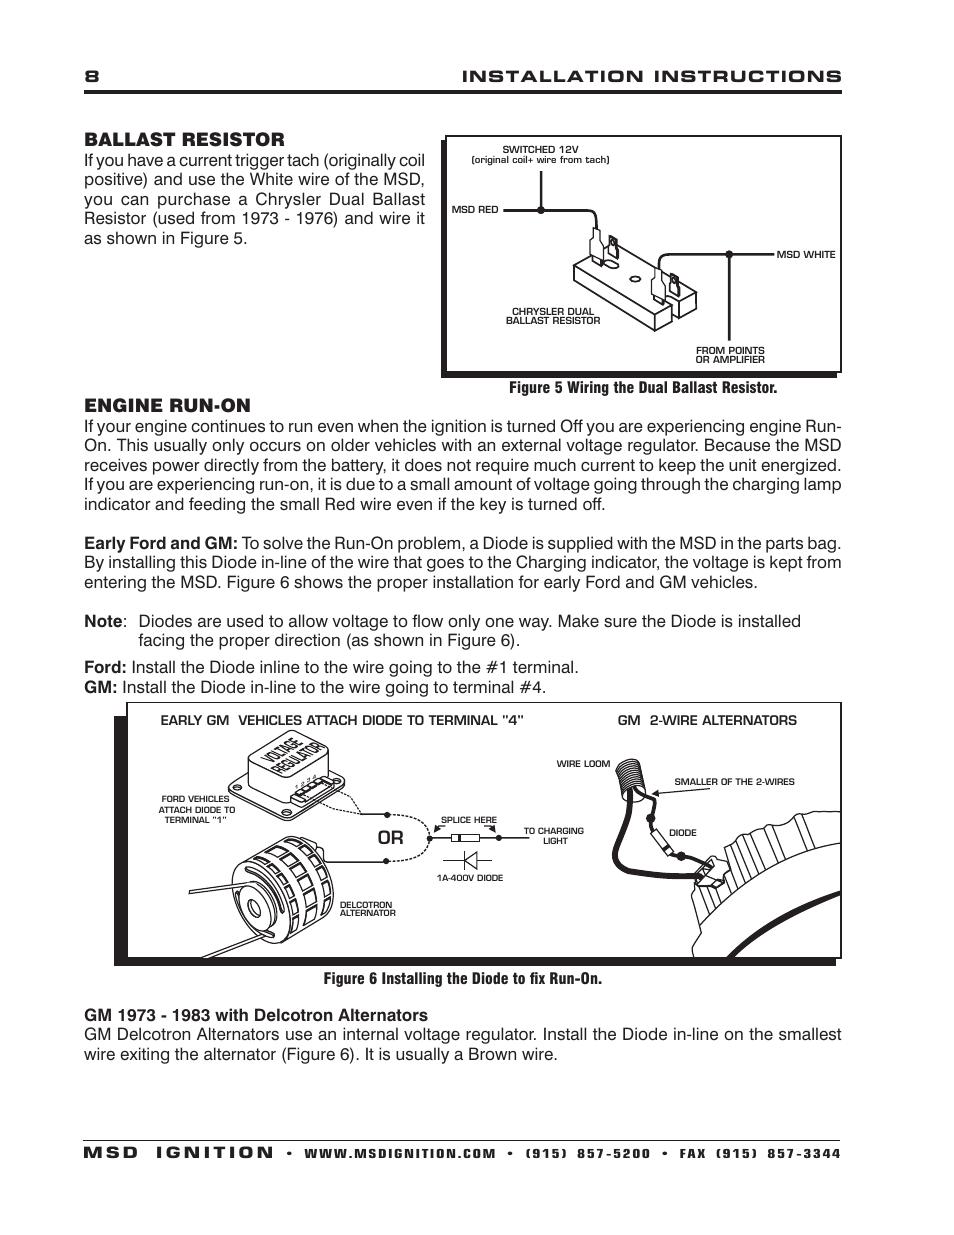 medium resolution of ballast resistor engine run on msd 6440 40th anniversary 6al ignition control installation user manual page 8 16